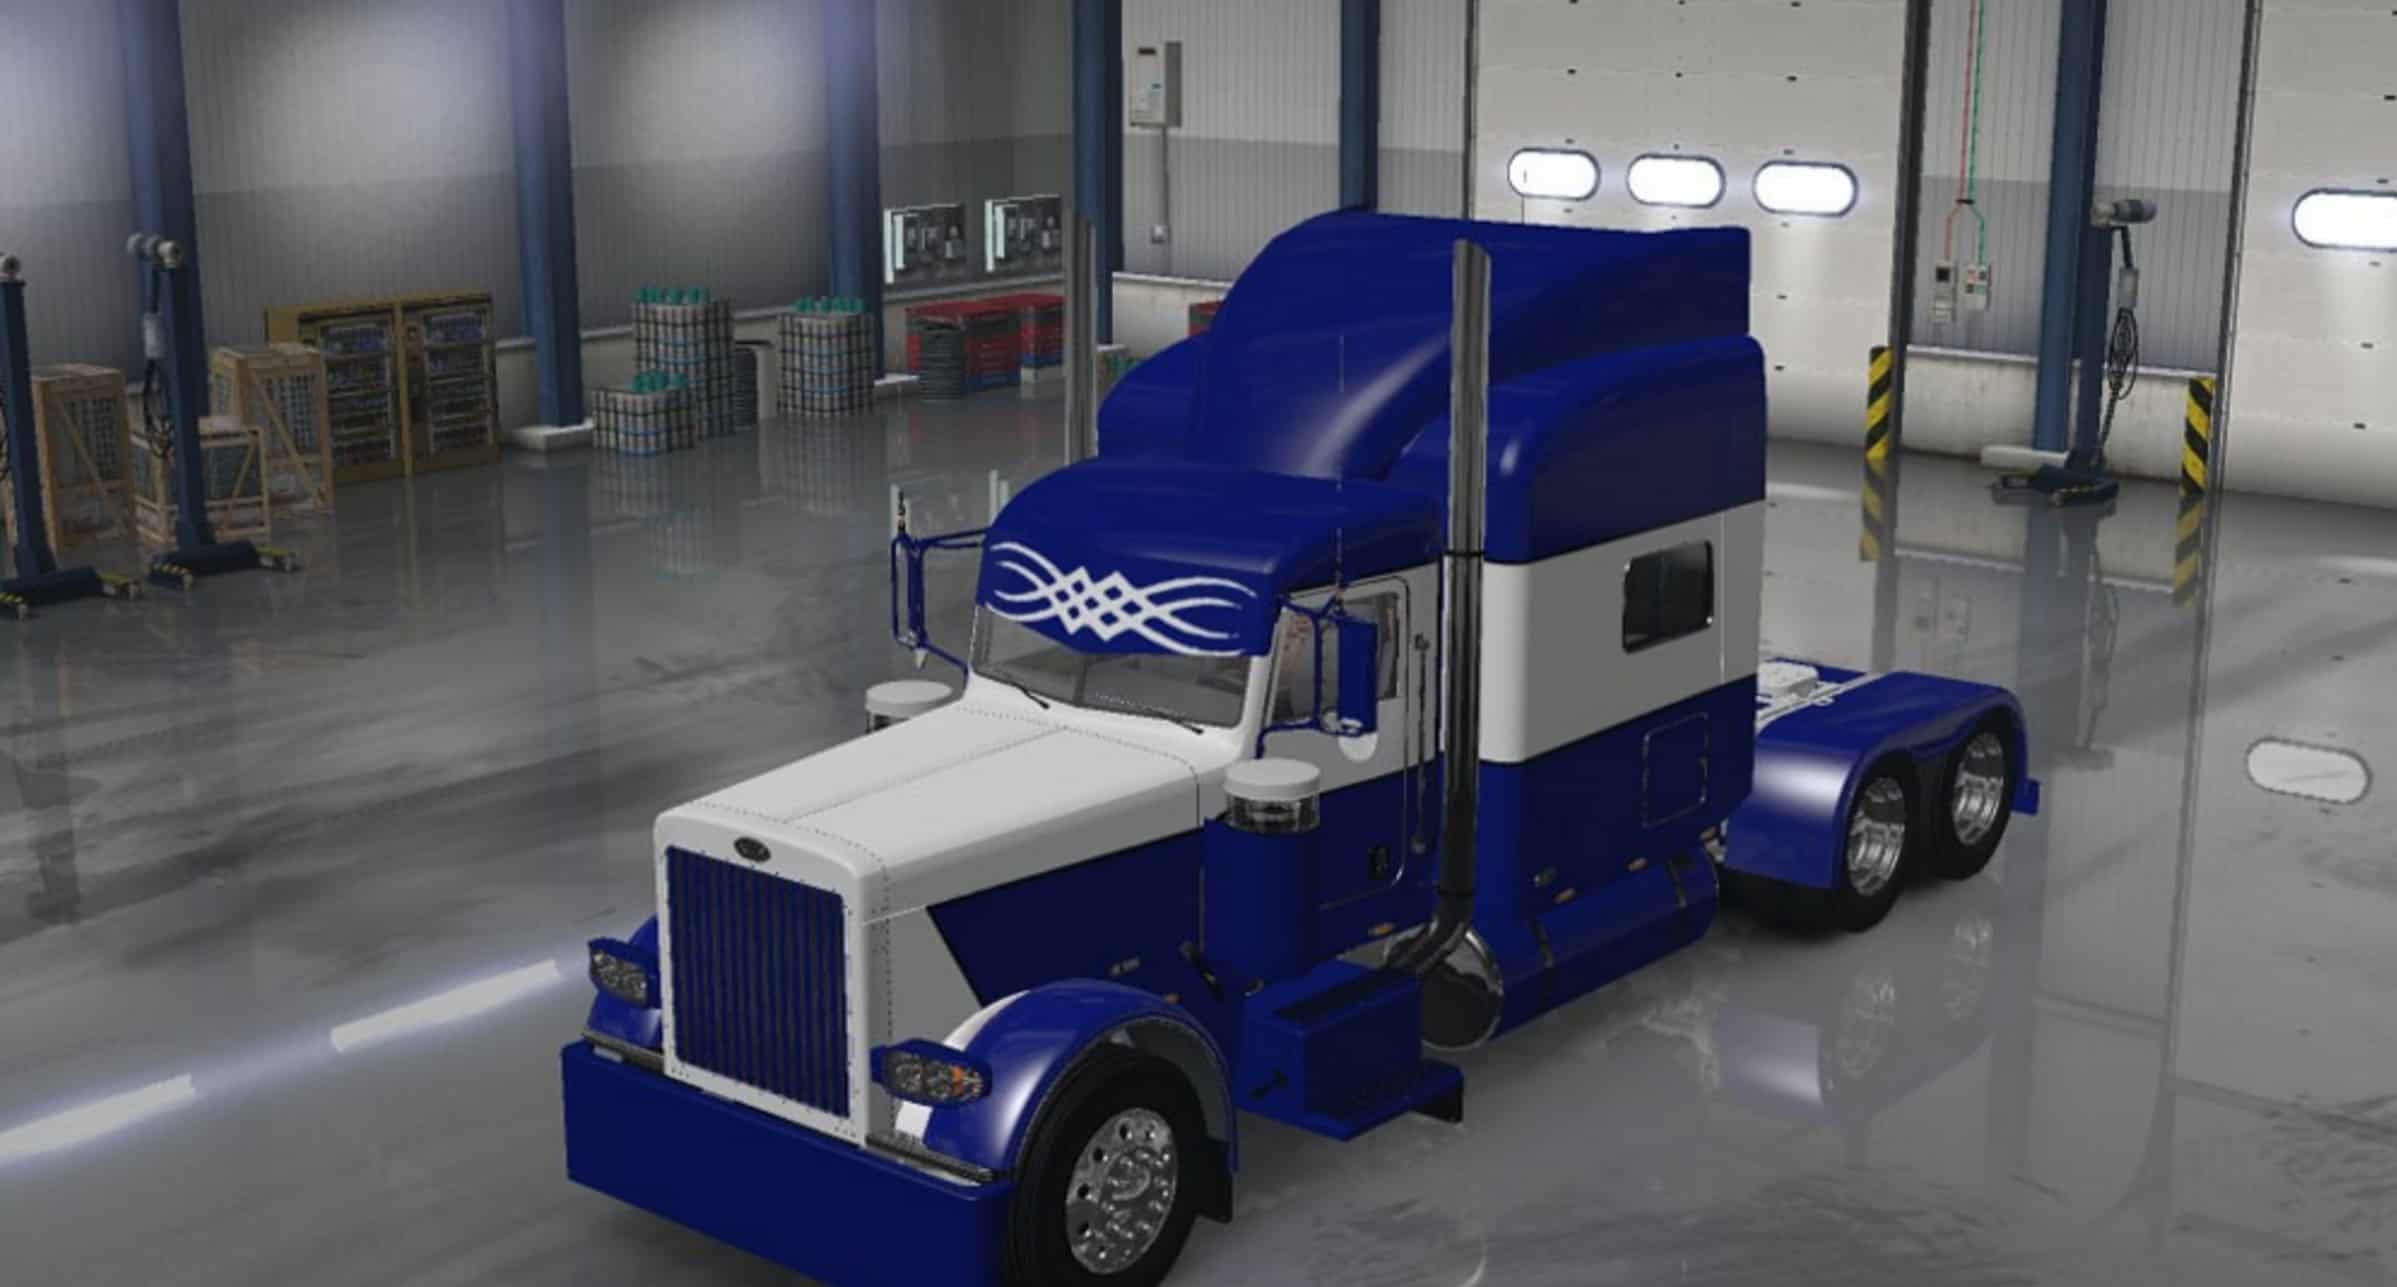 Peterbilt 389 Blue And White Skin Update For Ats American Truck Simulator Mod Ats Mod